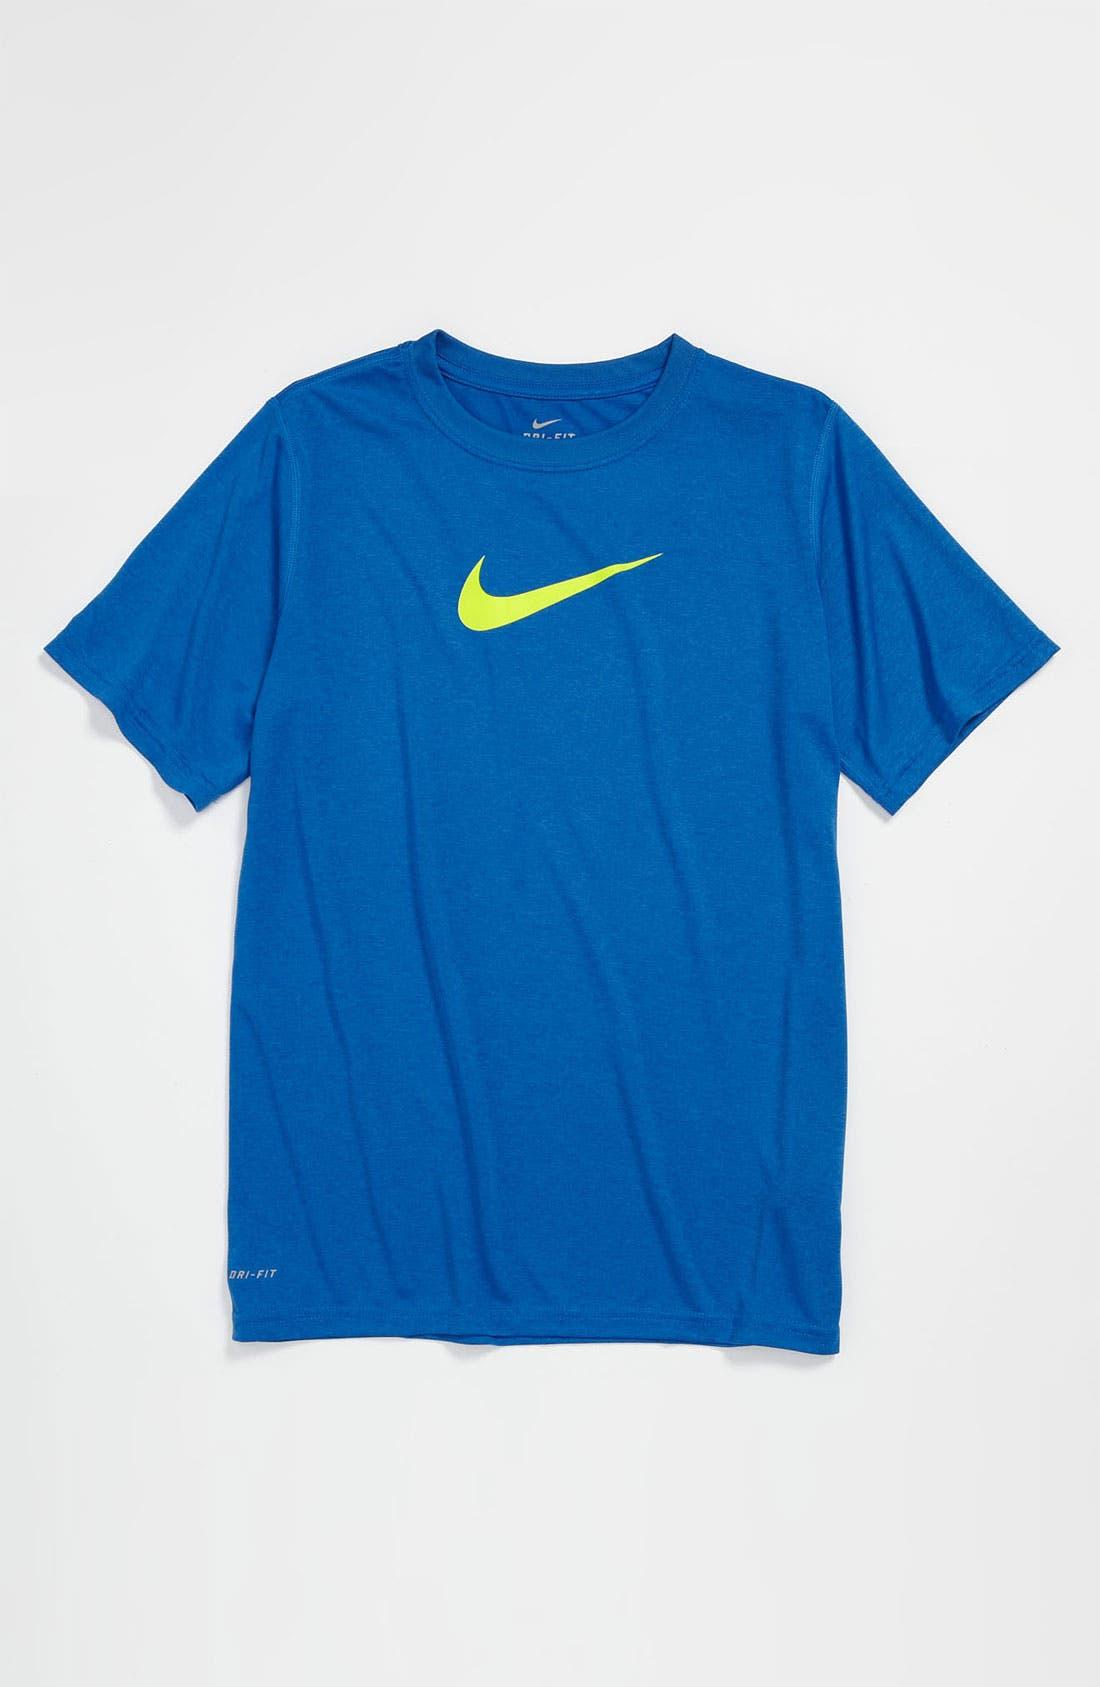 Main Image - Nike 'Legends' Dri-FIT Crewneck T-Shirt (Big Boys)